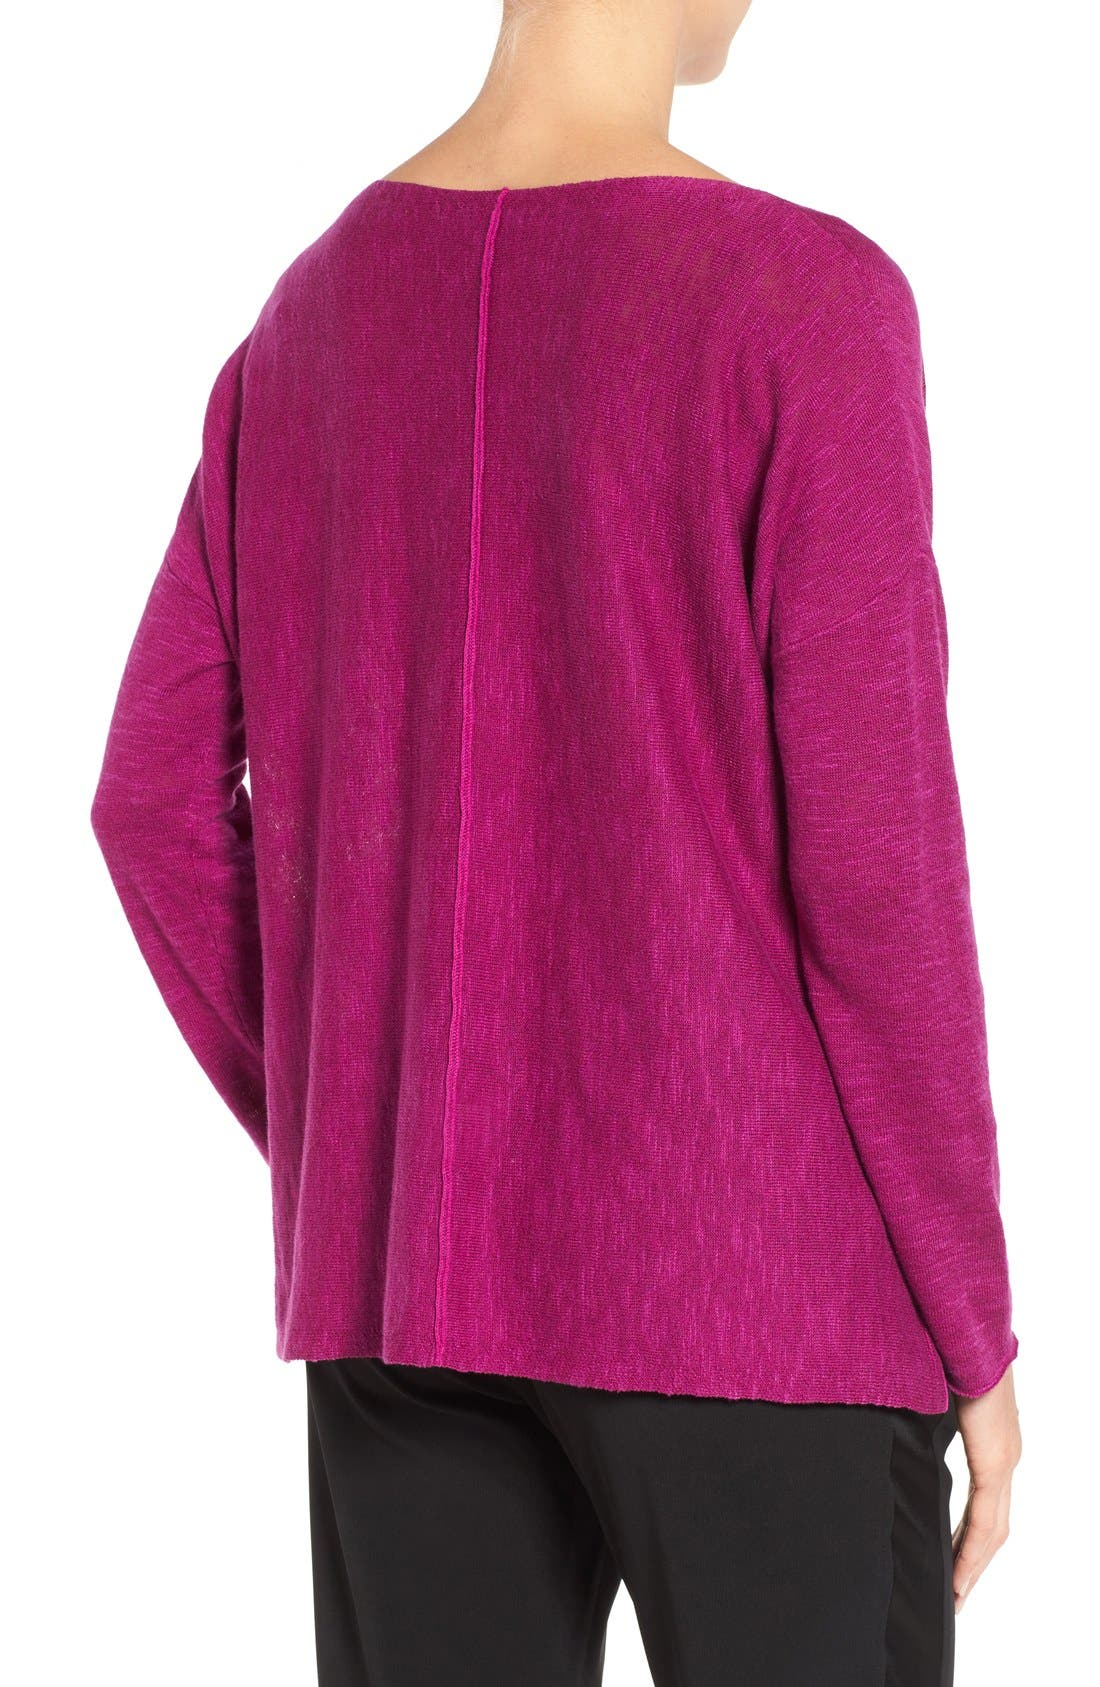 Alternate Image 2  - Eileen Fisher Organic Linen & Cotton Top (Regular & Petite)